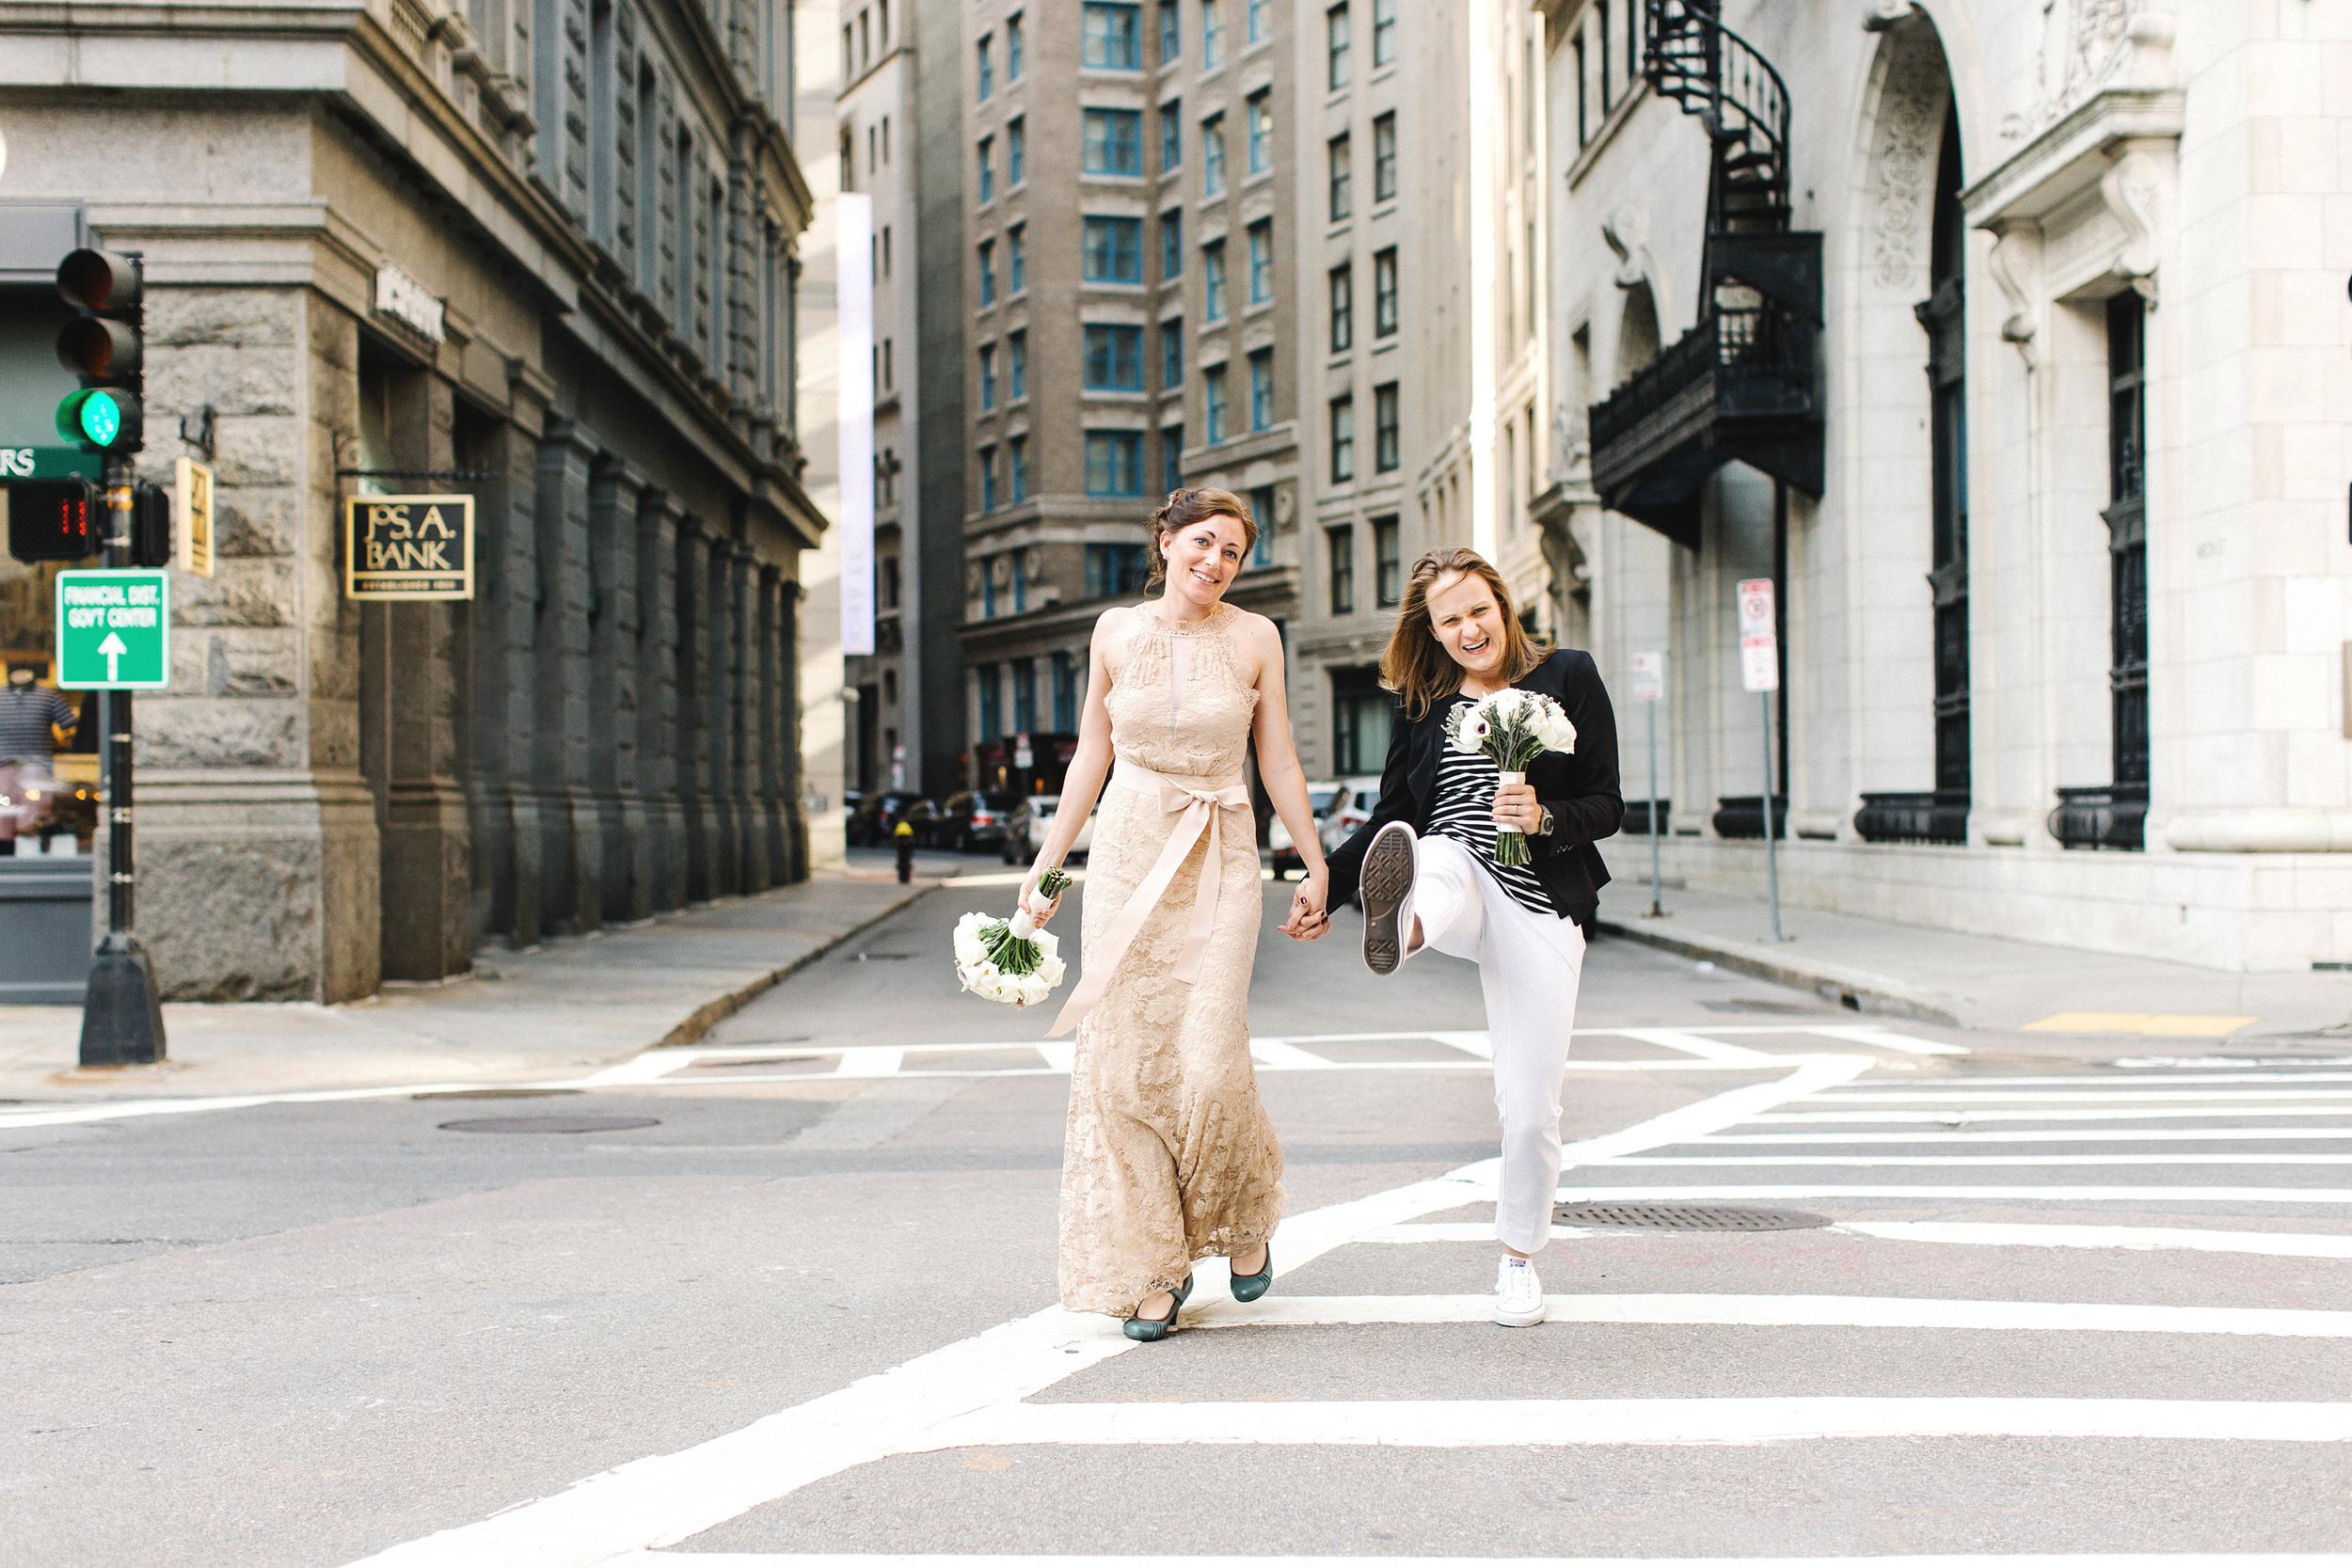 Boston_Wedding_Photographer_Lena_Mirisola-29.jpg